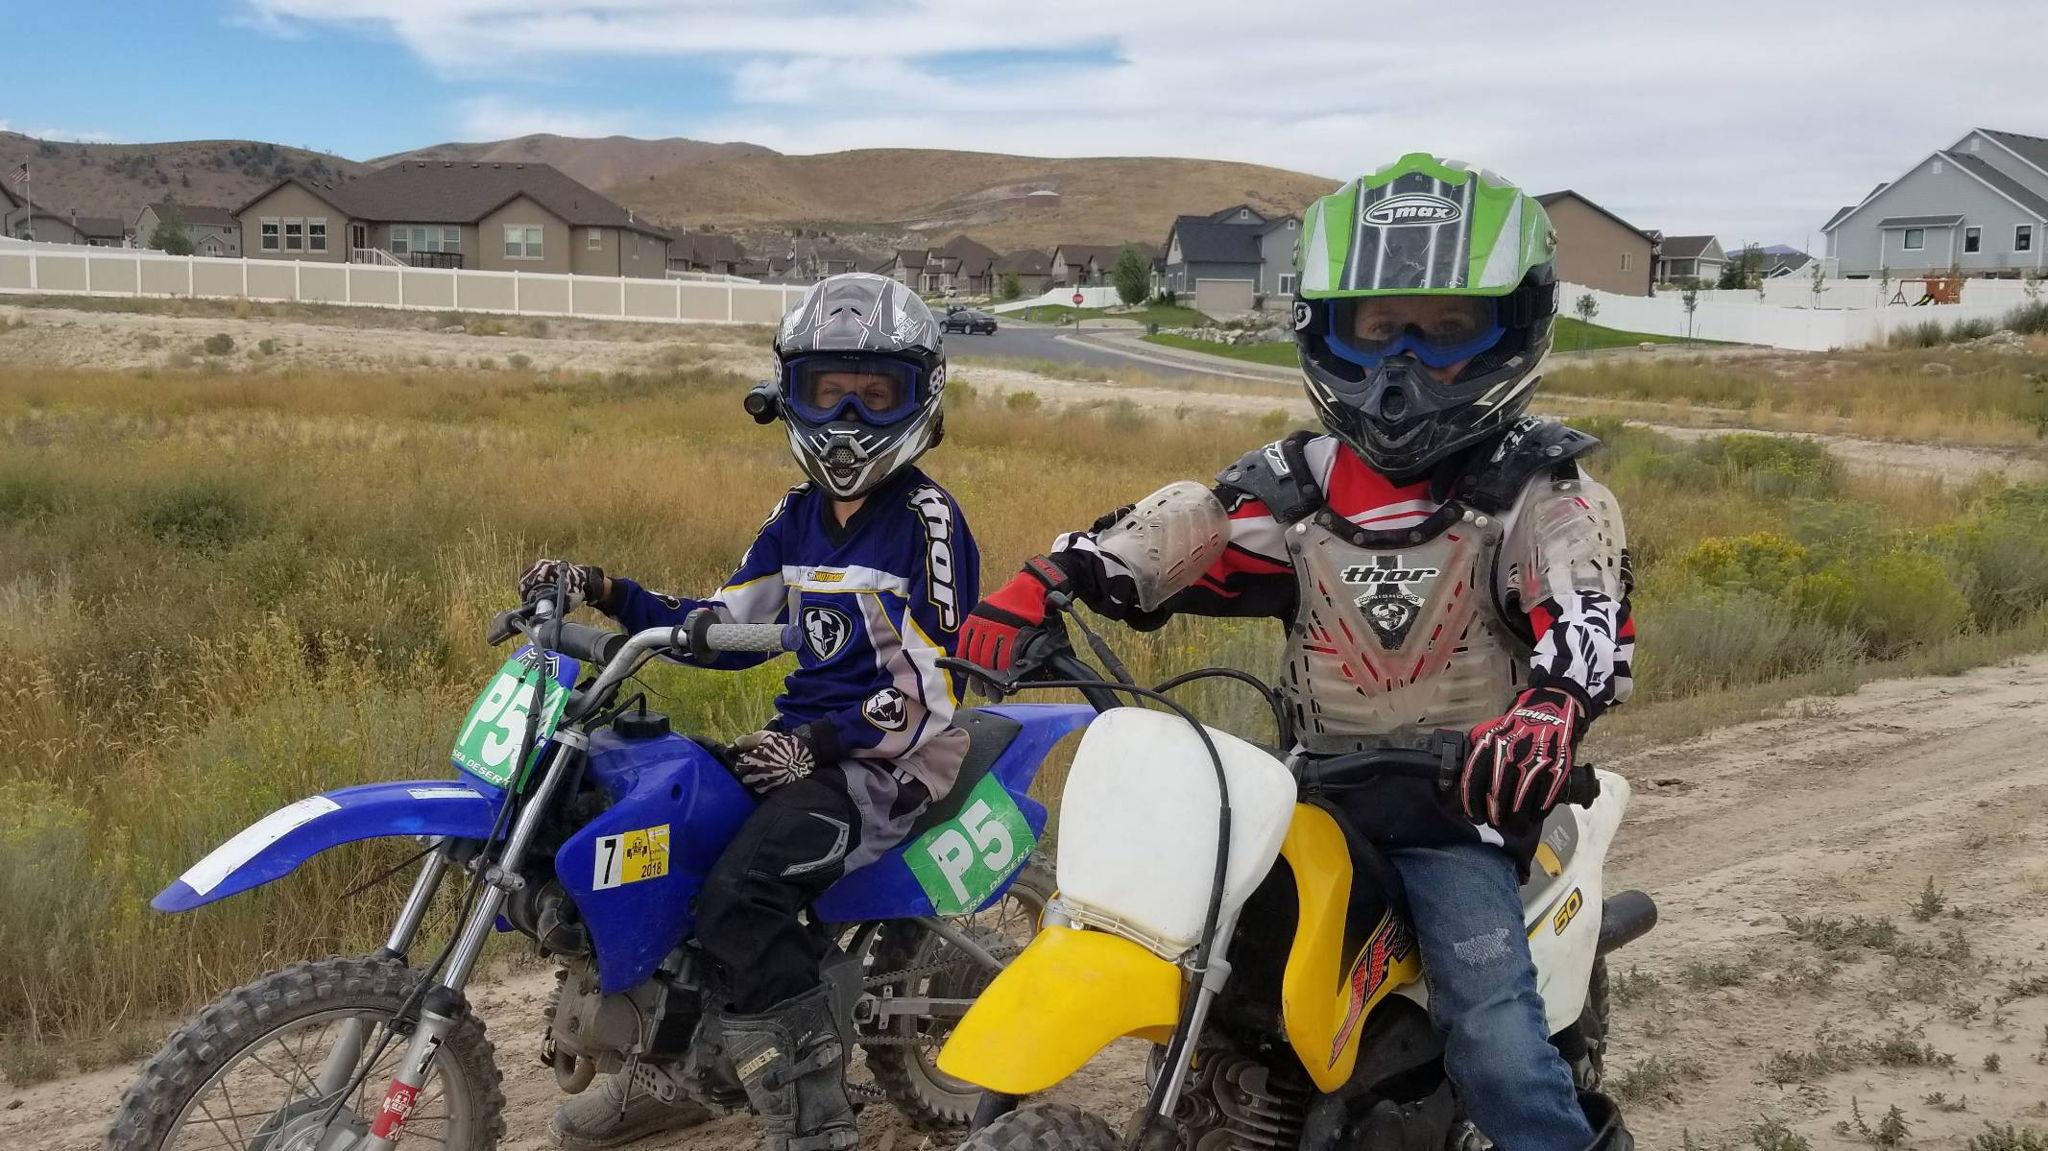 Suzuki Jr 80 For Rent Near Eagle Mountain Ut Riders Share